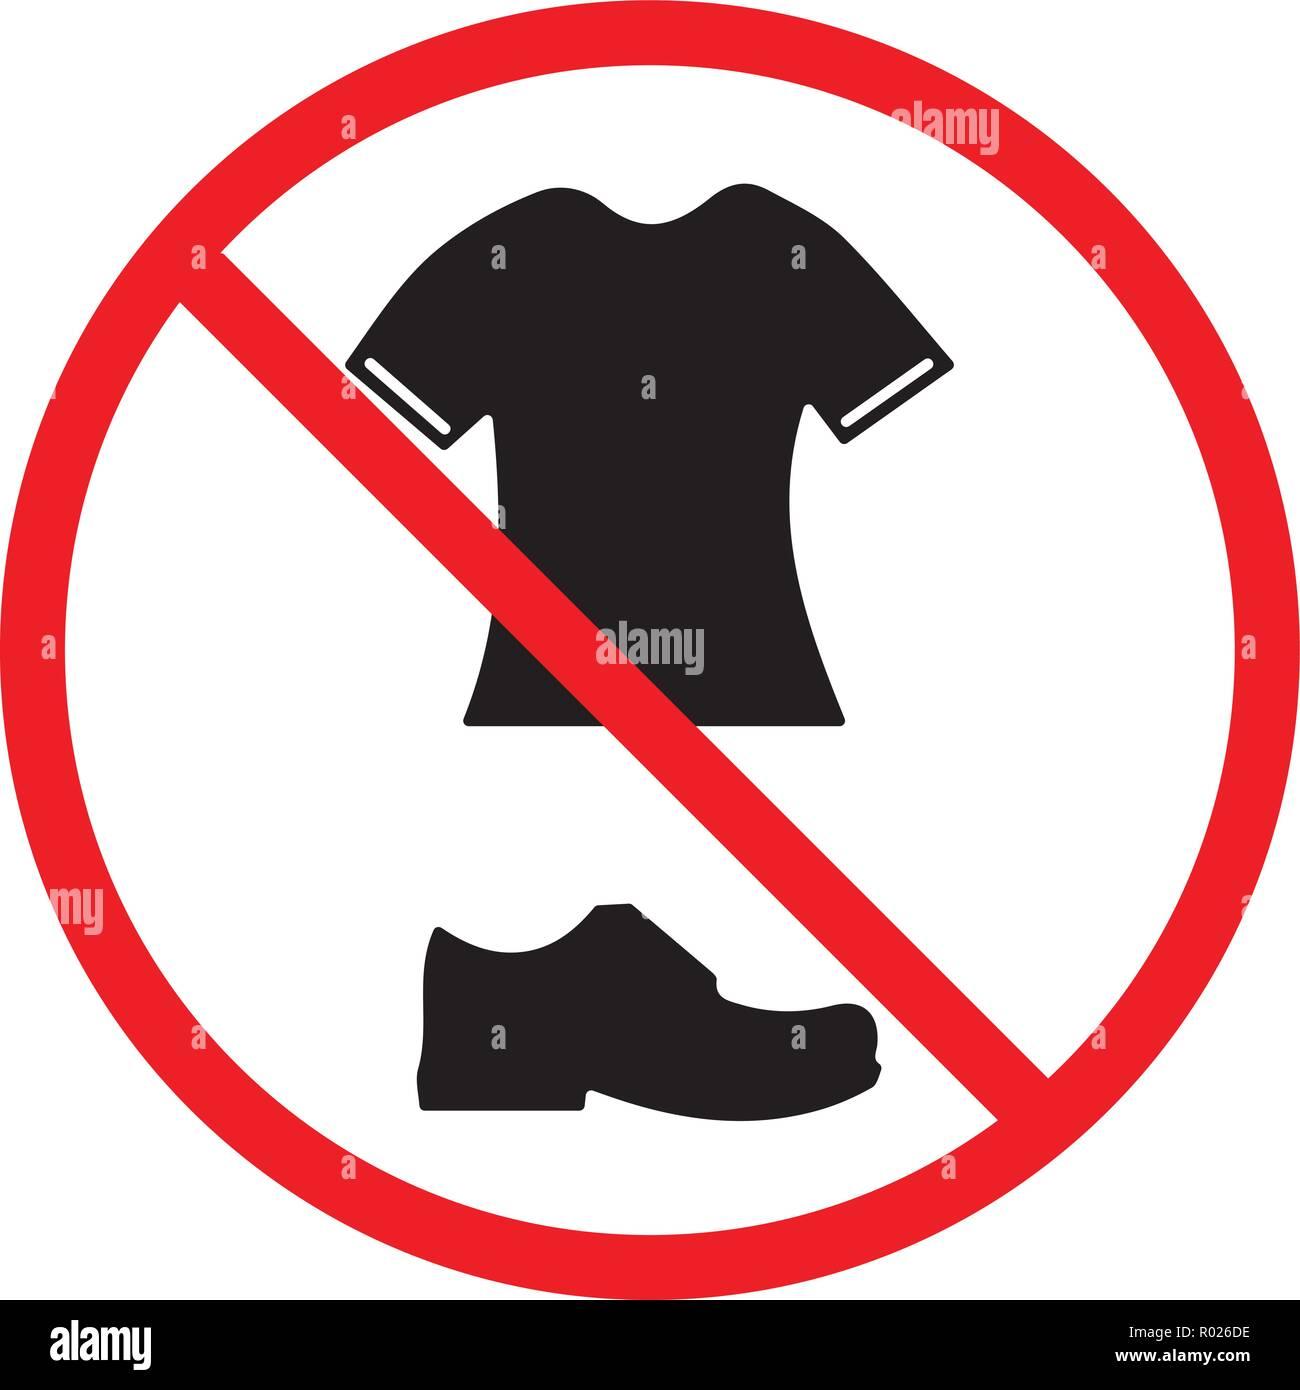 1f2b3f73fe7a9e Keine T-Shirts und Schuhe im Pool erlaubt Vektor Abbildung - Bild ...